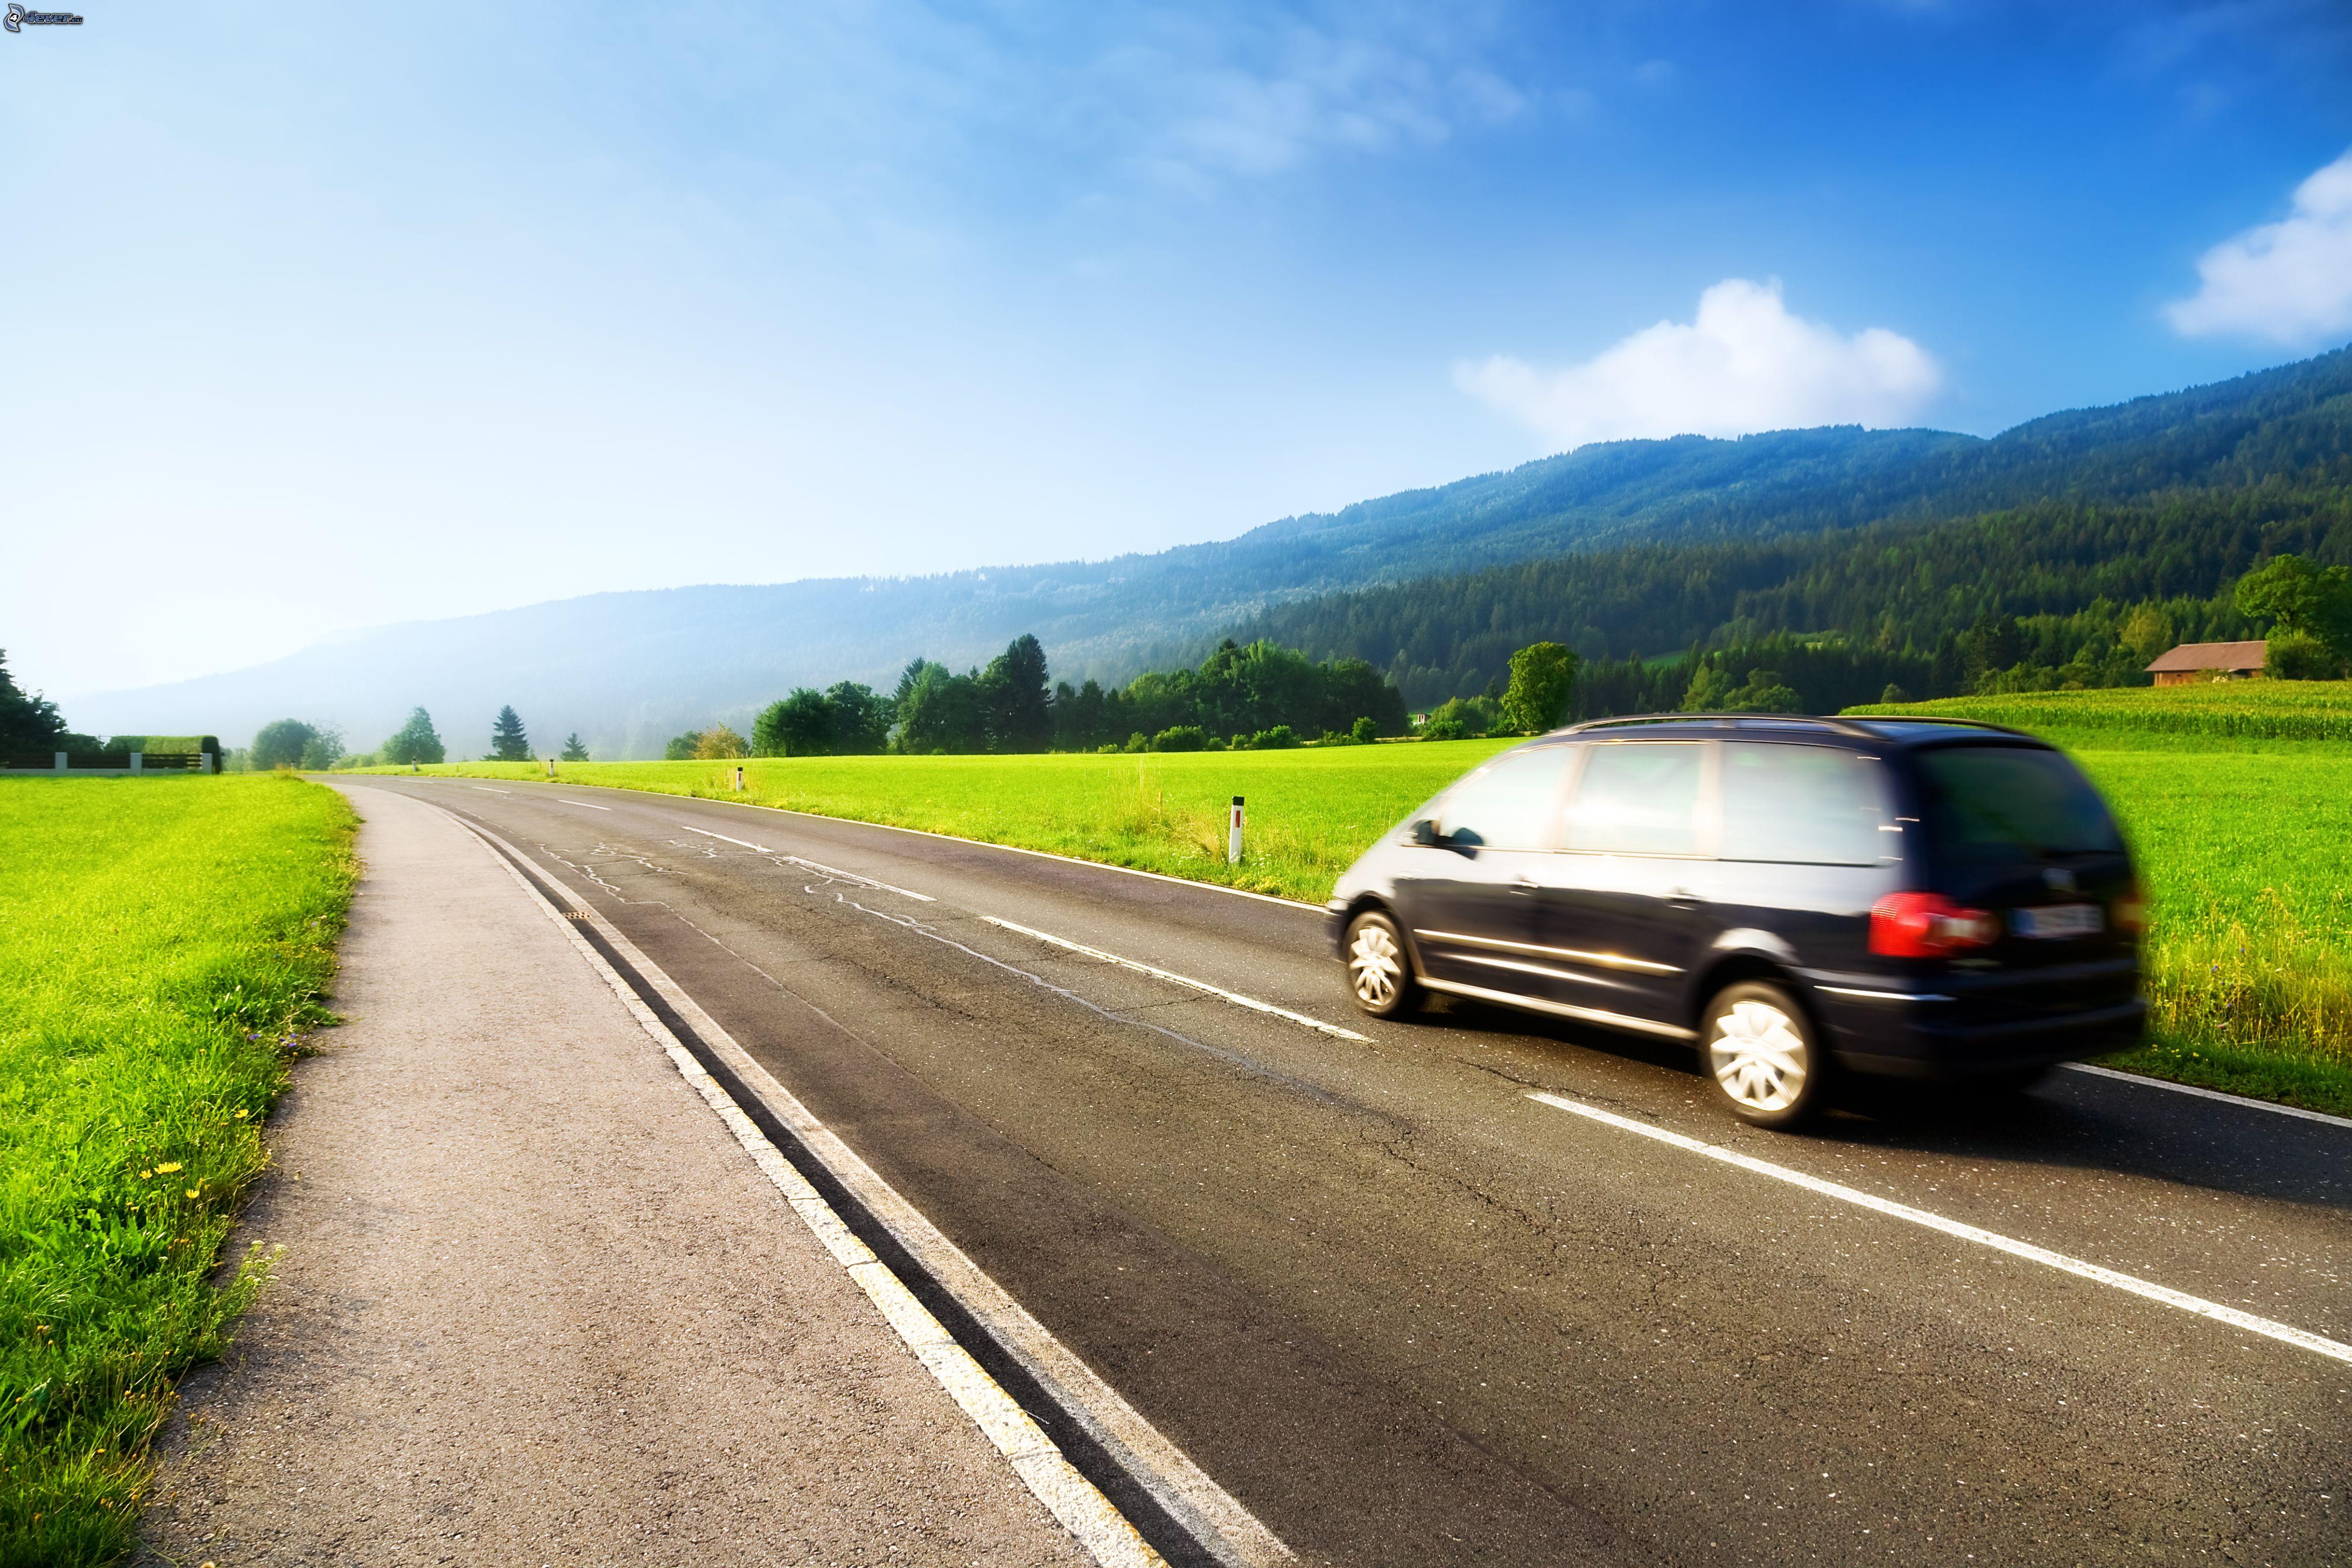 Road travel photo